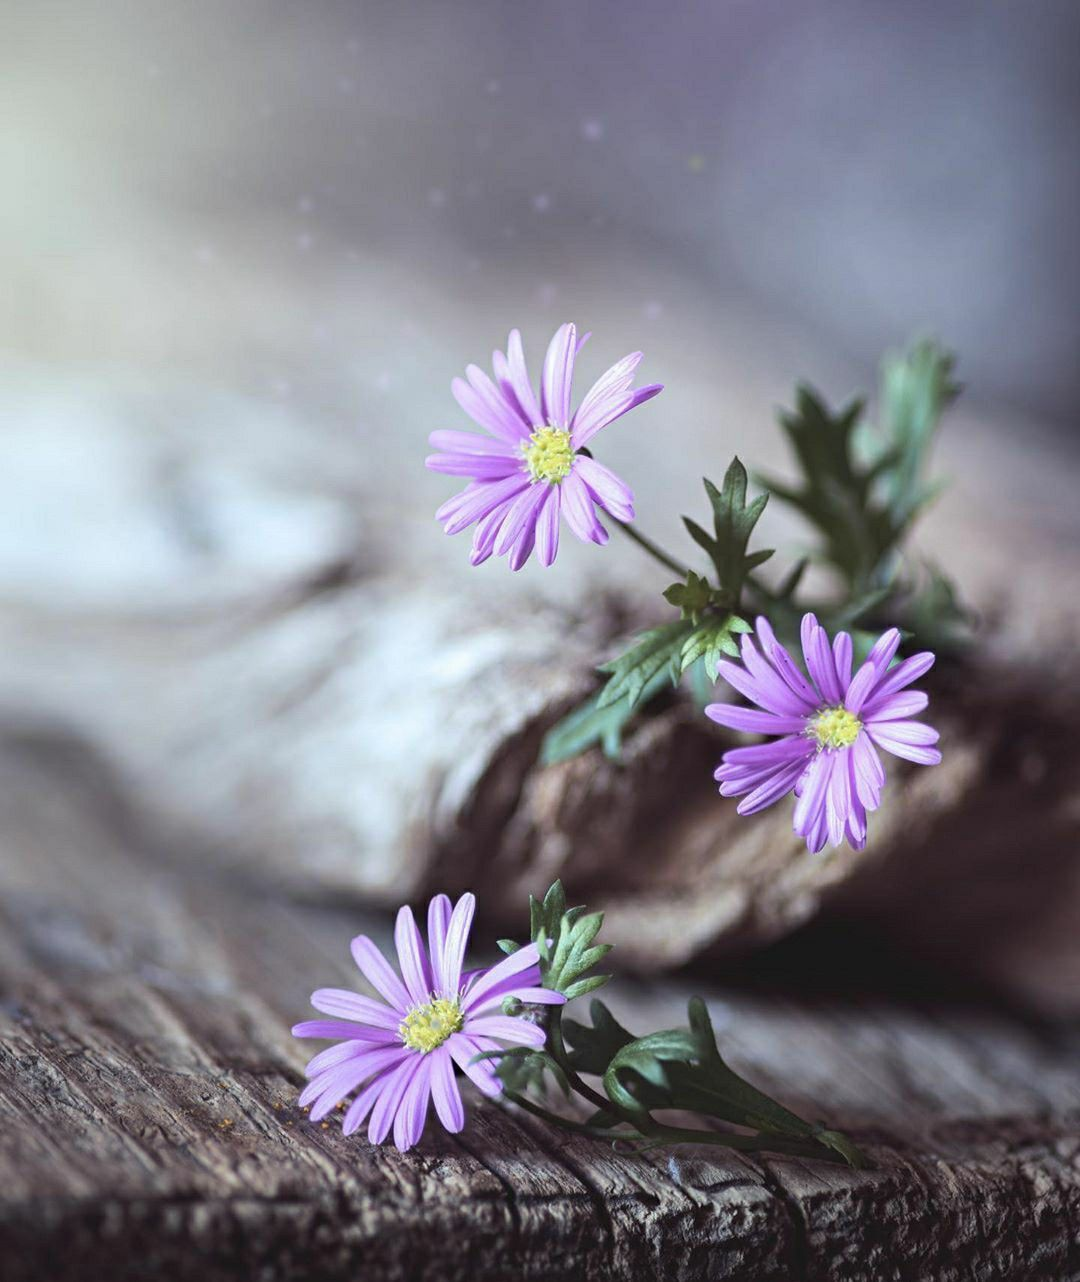 Pin By Neyra Arleth Bm On Foto In 2020 Book Flowers Beautiful Flowers Flowers